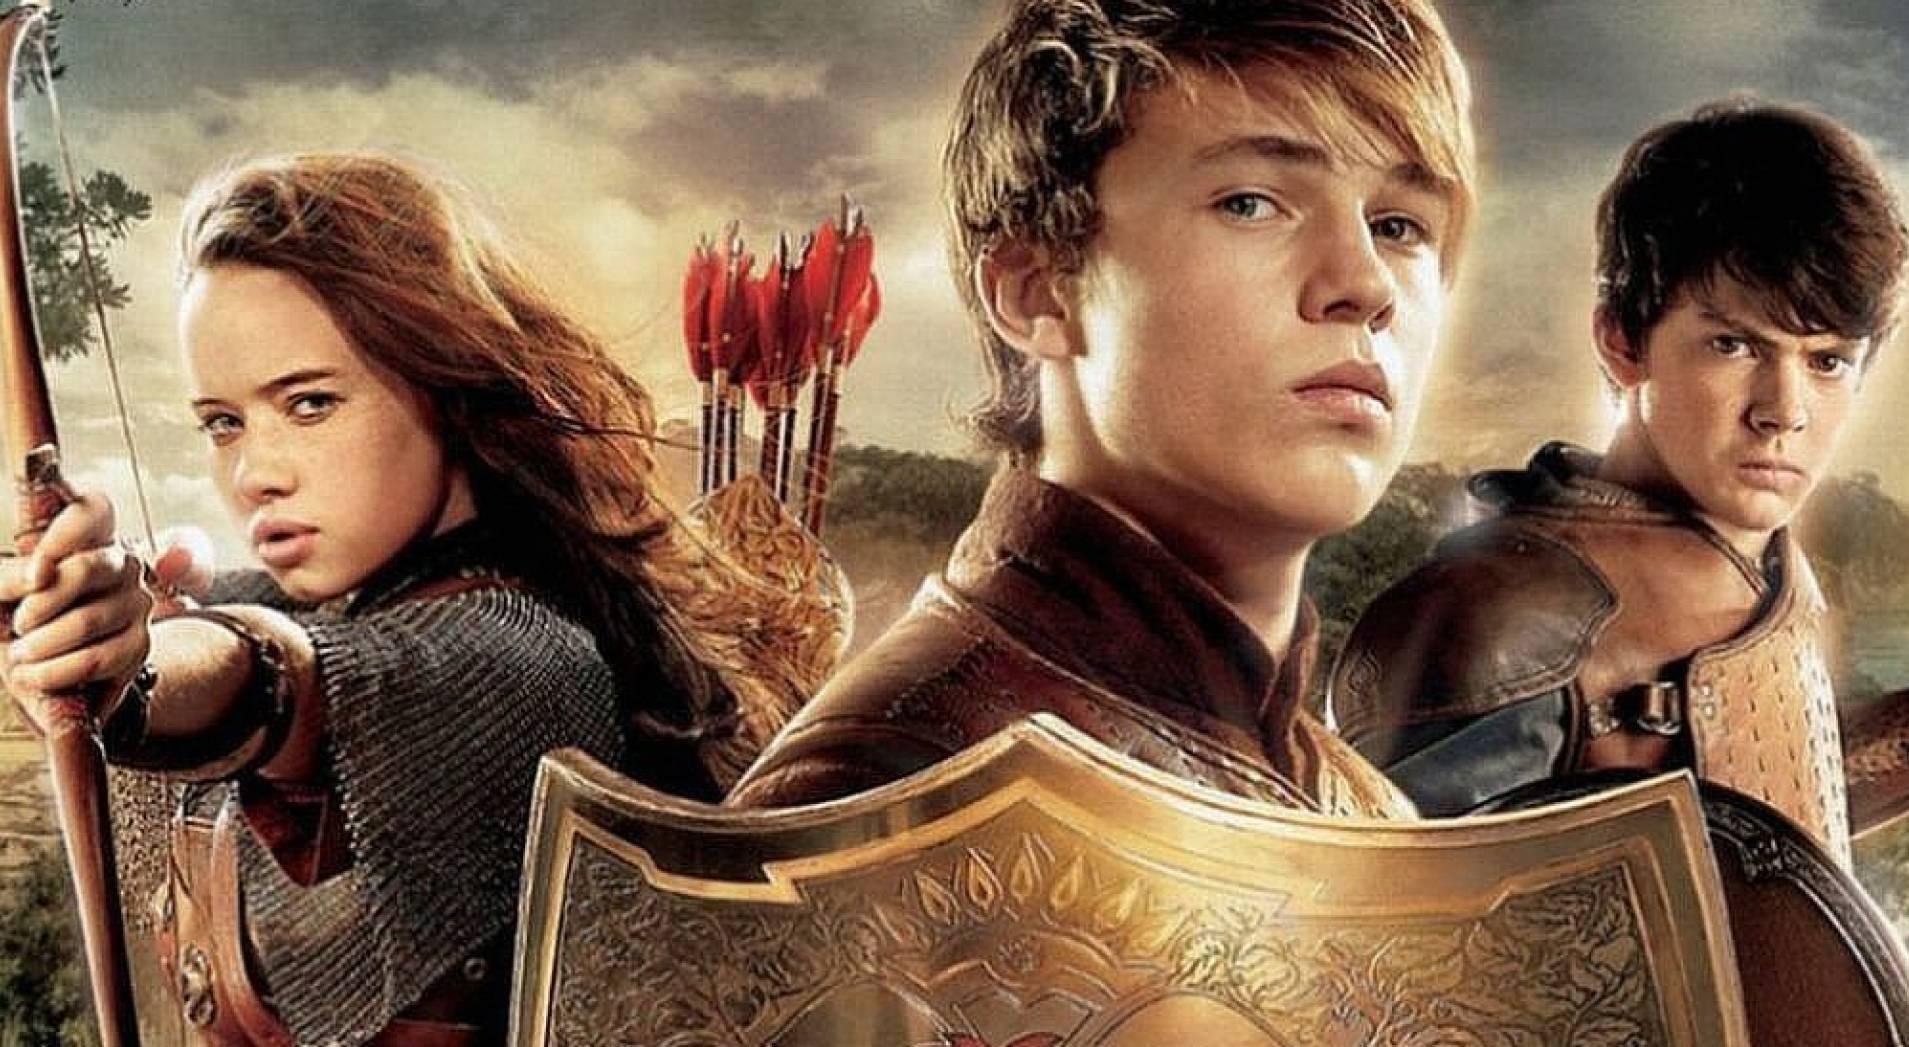 El mundo de Narnia llegará al catálogo de Netflix